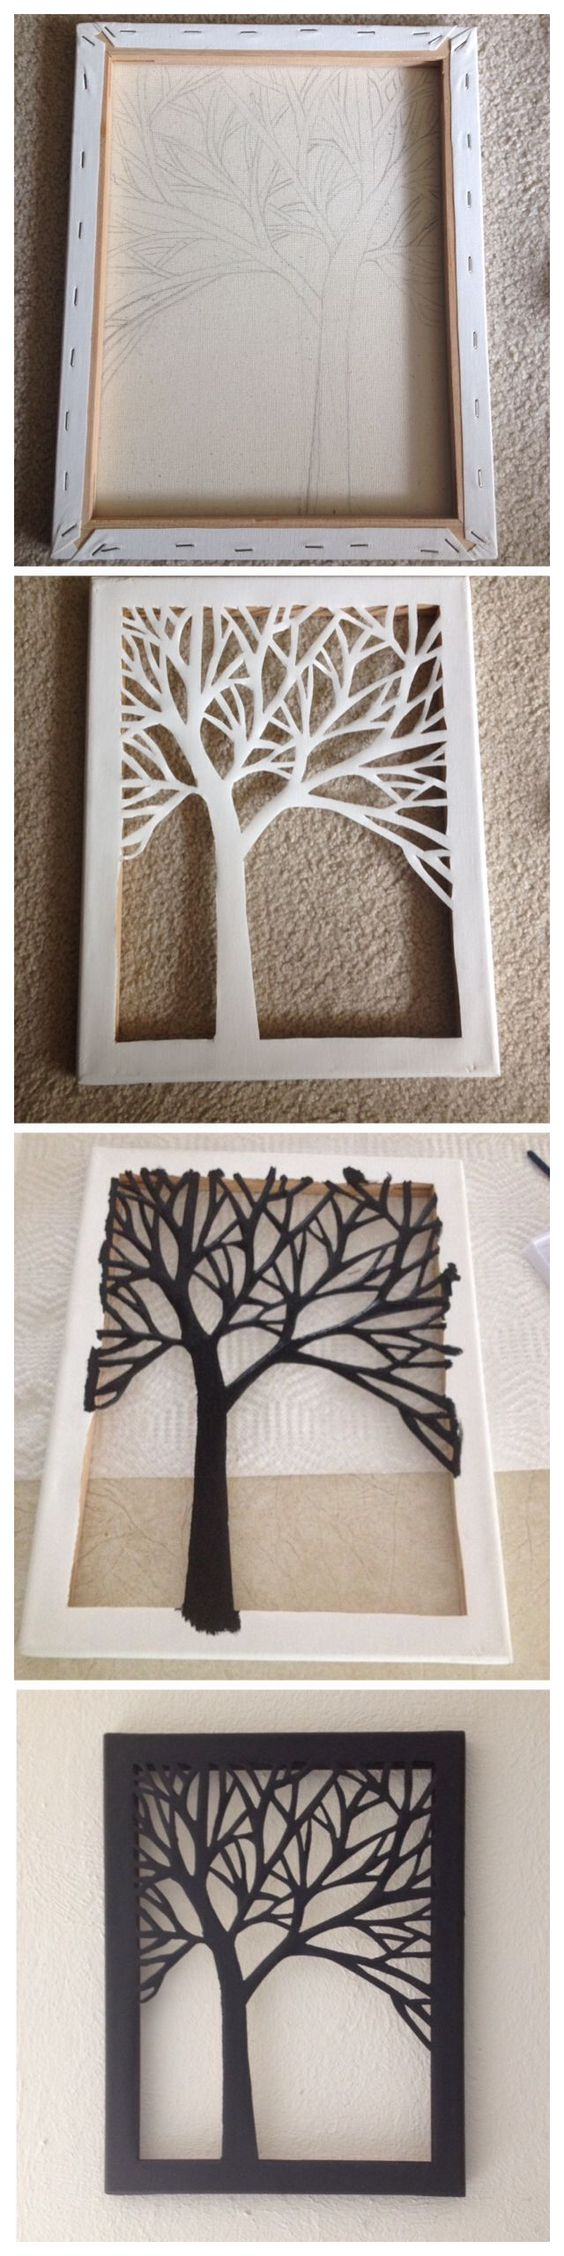 DIY Cut Canvas Tree Art